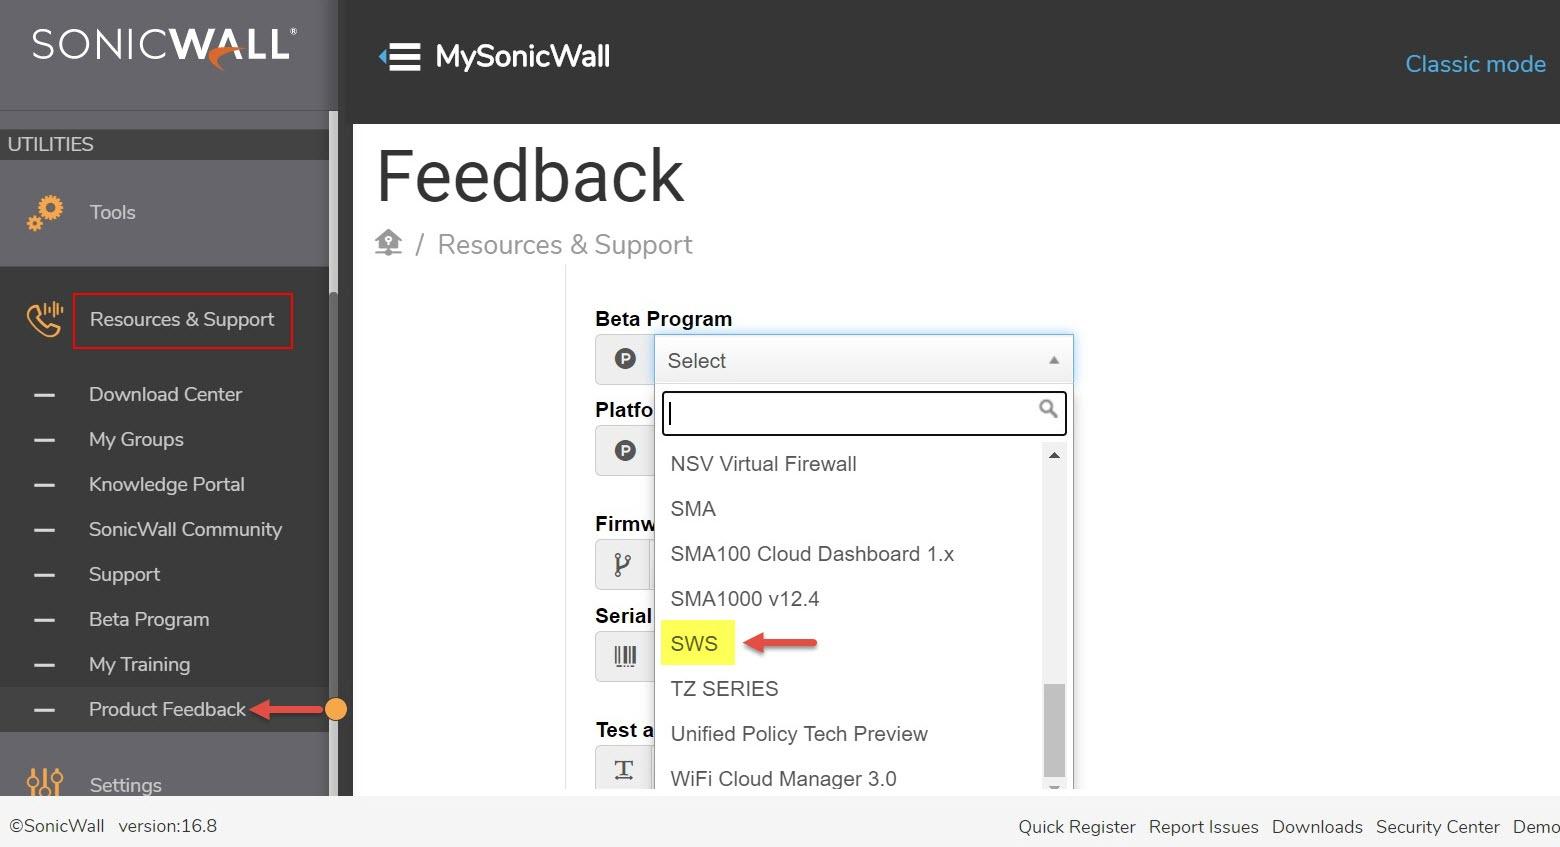 SonicWall SWS Feedback.jpg